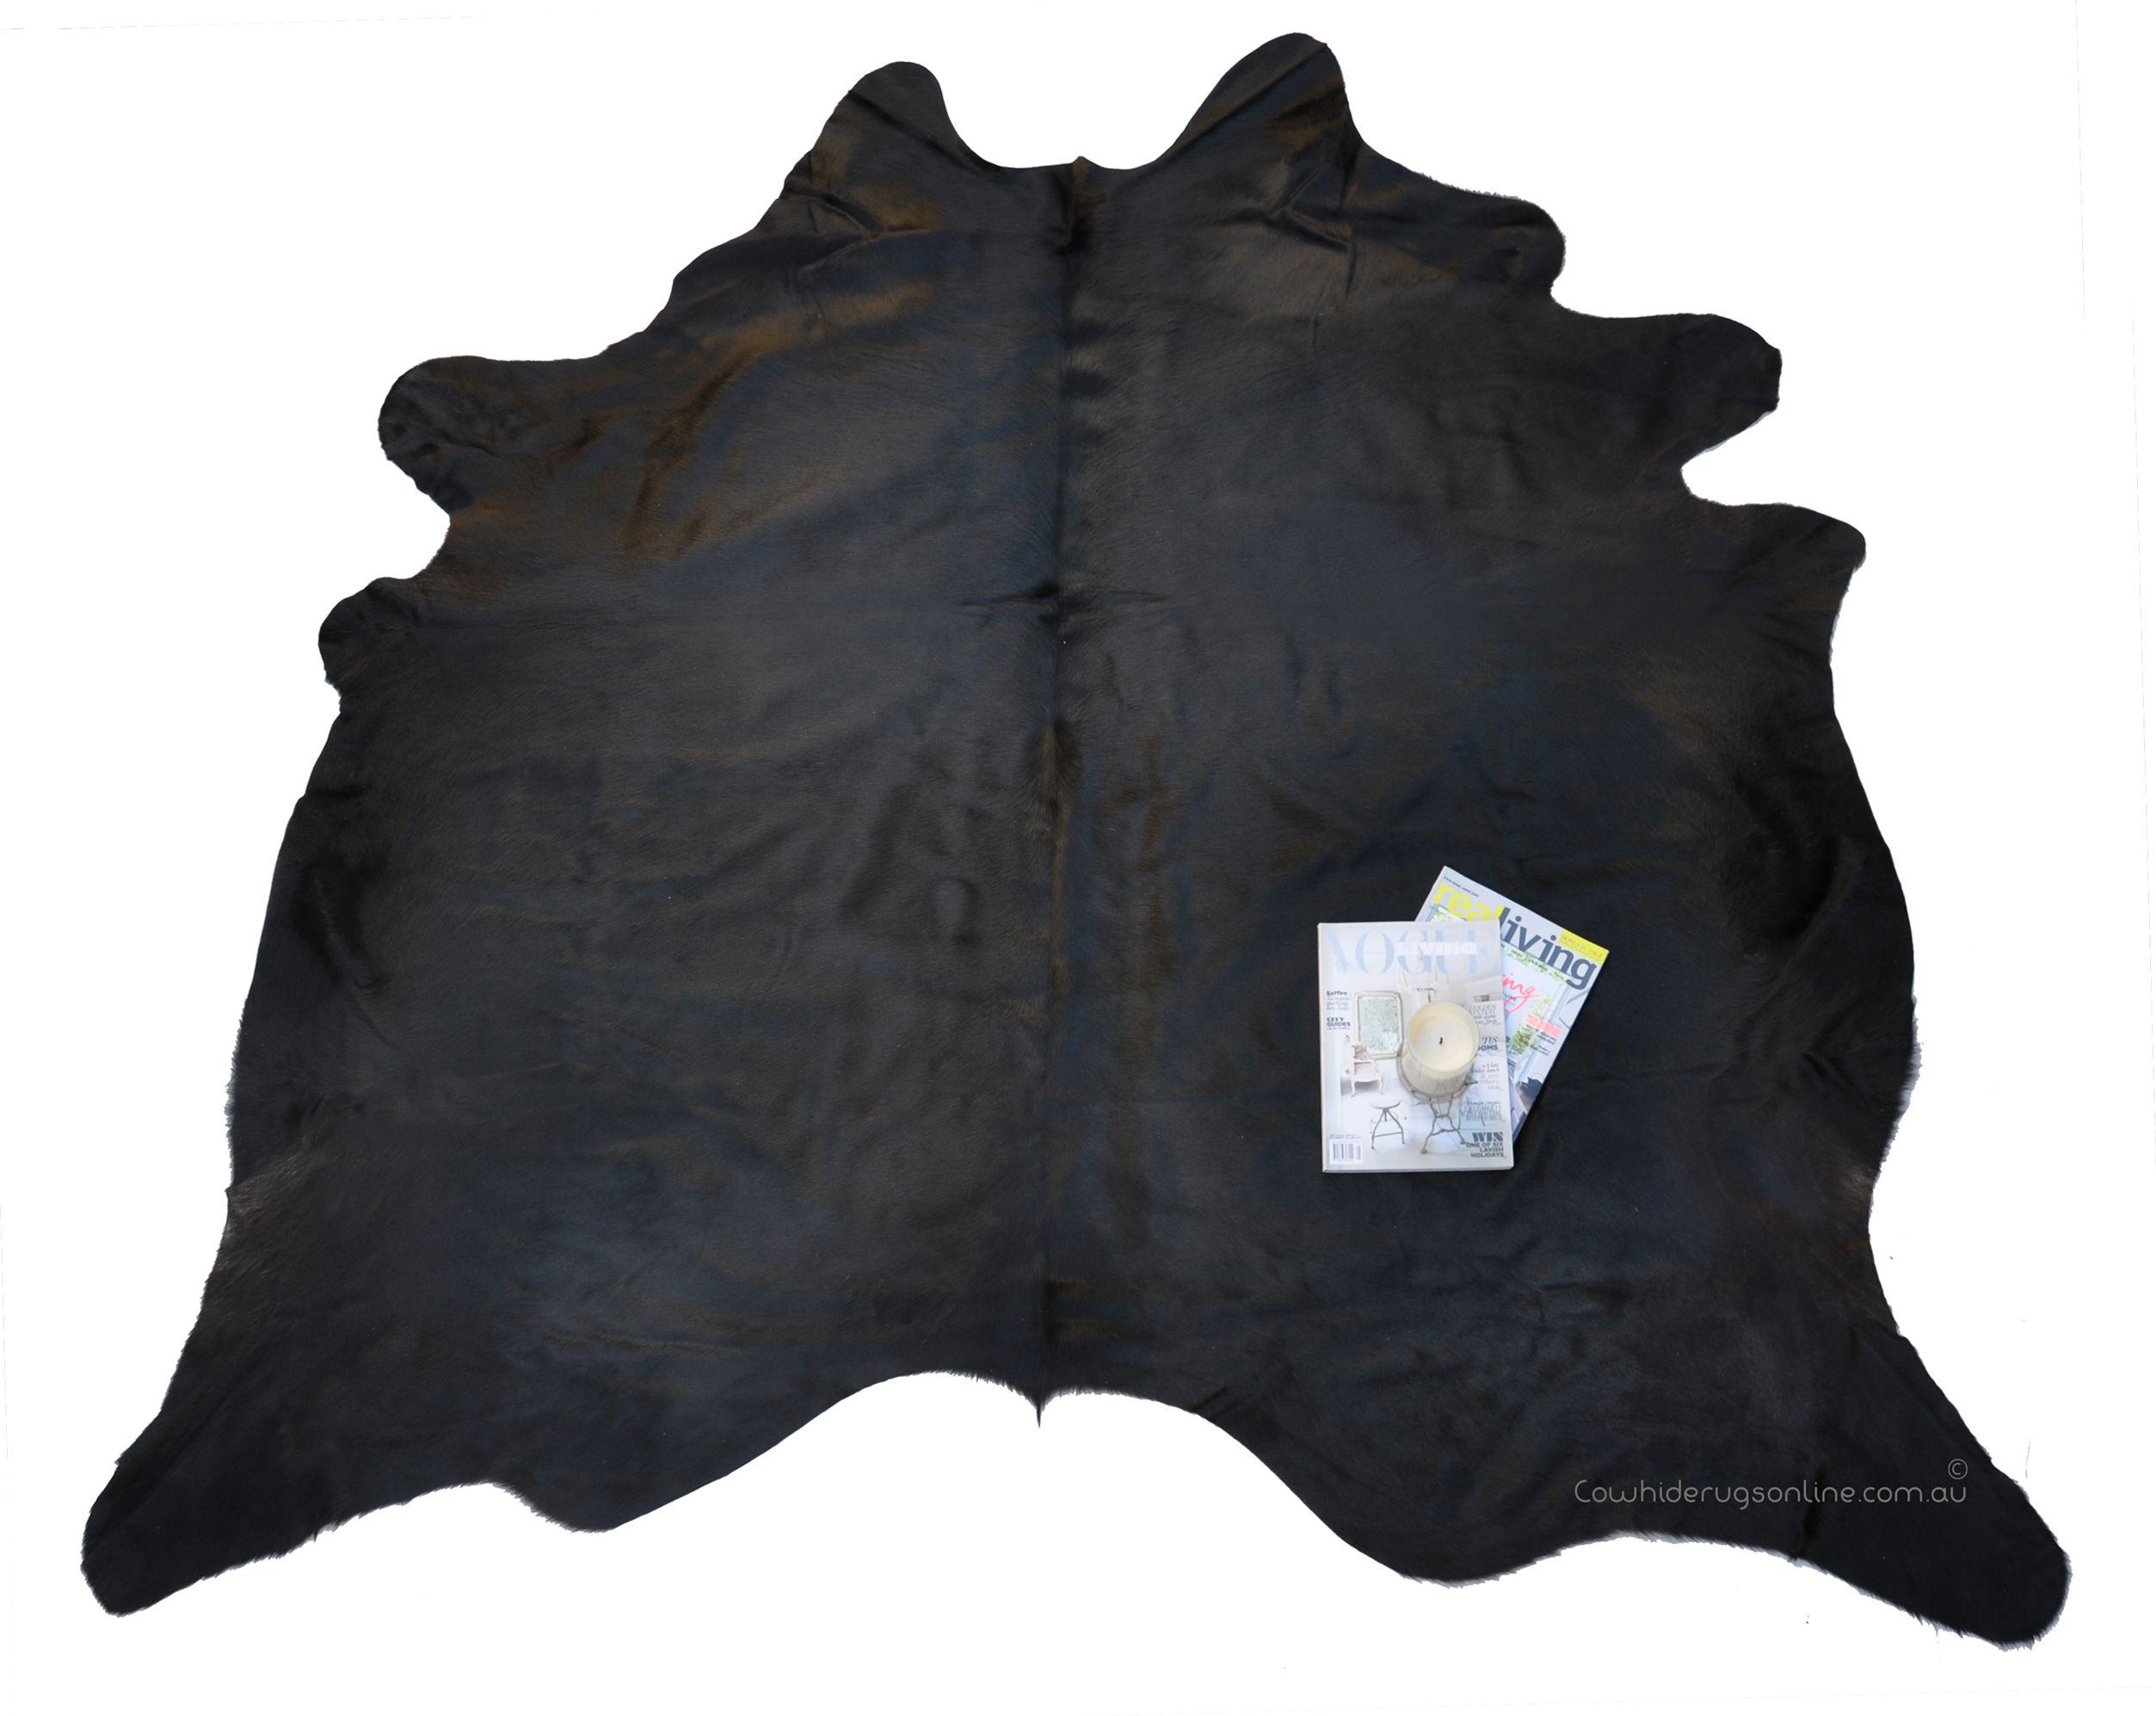 Black White Cowhide Leather Rug 349 Www Cowhiderugsonline Au Australia